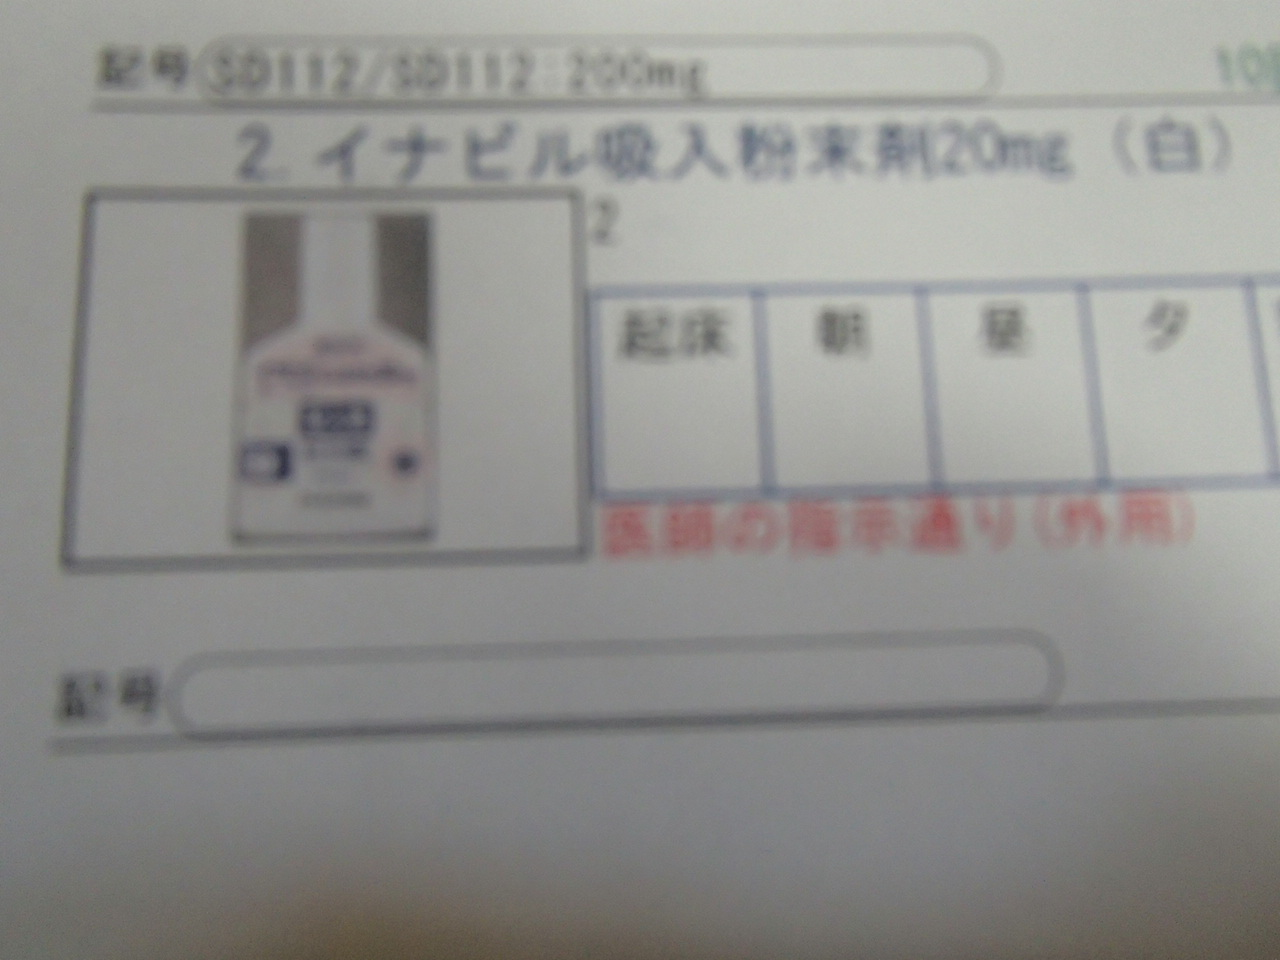 P1301736.jpg